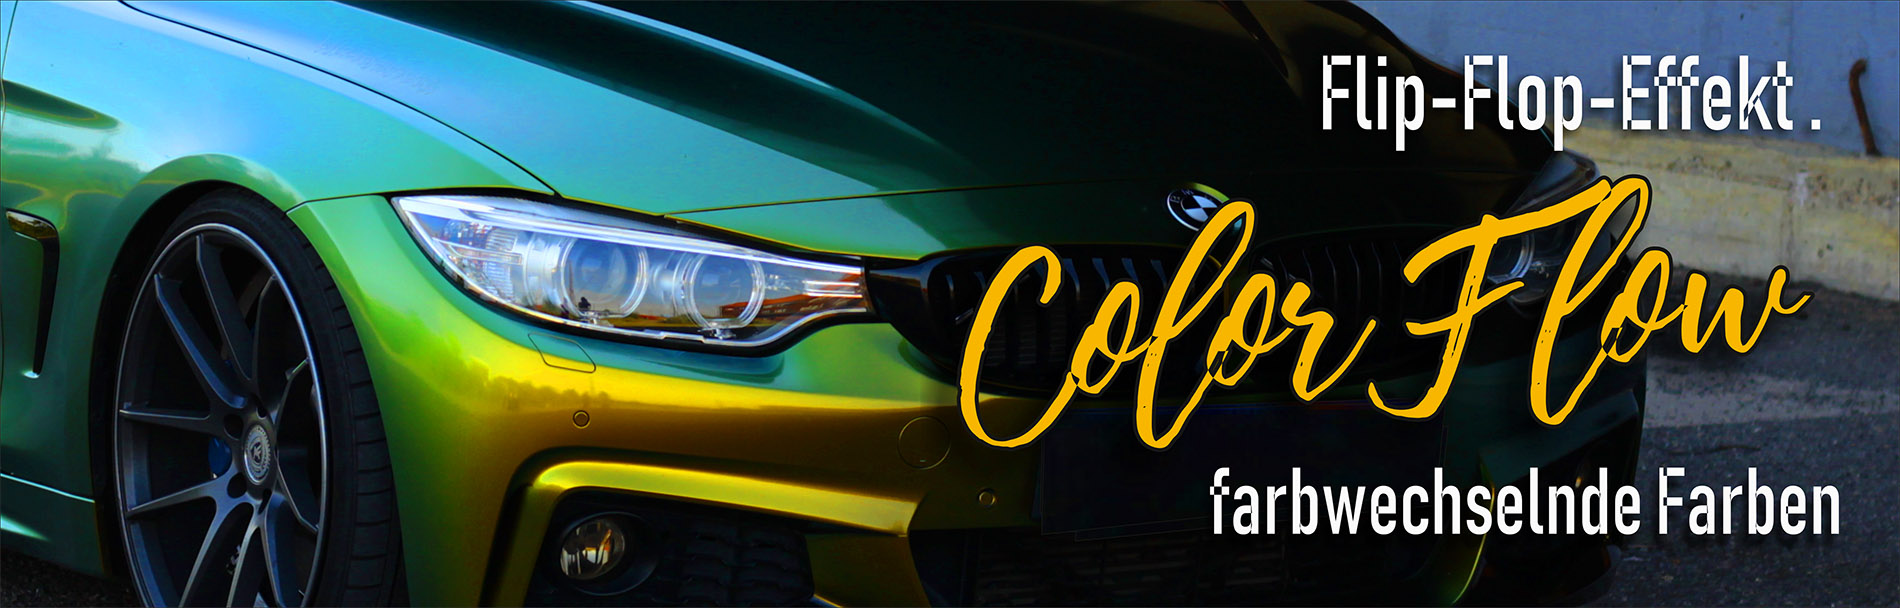 Premium Car Wrap, folie fürs auto, matt folie, folierung preise, teilfolierung, folienbeschichtung, fahrzeugvollverklebung, autovollfolierung, fahrzeug vollfolierung, auto vollverklebung, teilverklebung, kfz folierung, autofolierung,Premium Car Wrap, folie fürs auto, matt folie, folierung preise, teilfolierung, folienbeschichtung, fahrzeugvollverklebung, autovollfolierung, fahrzeug vollfolierung, auto vollverklebung, teilverklebung, kfz folierung, autofolierung,